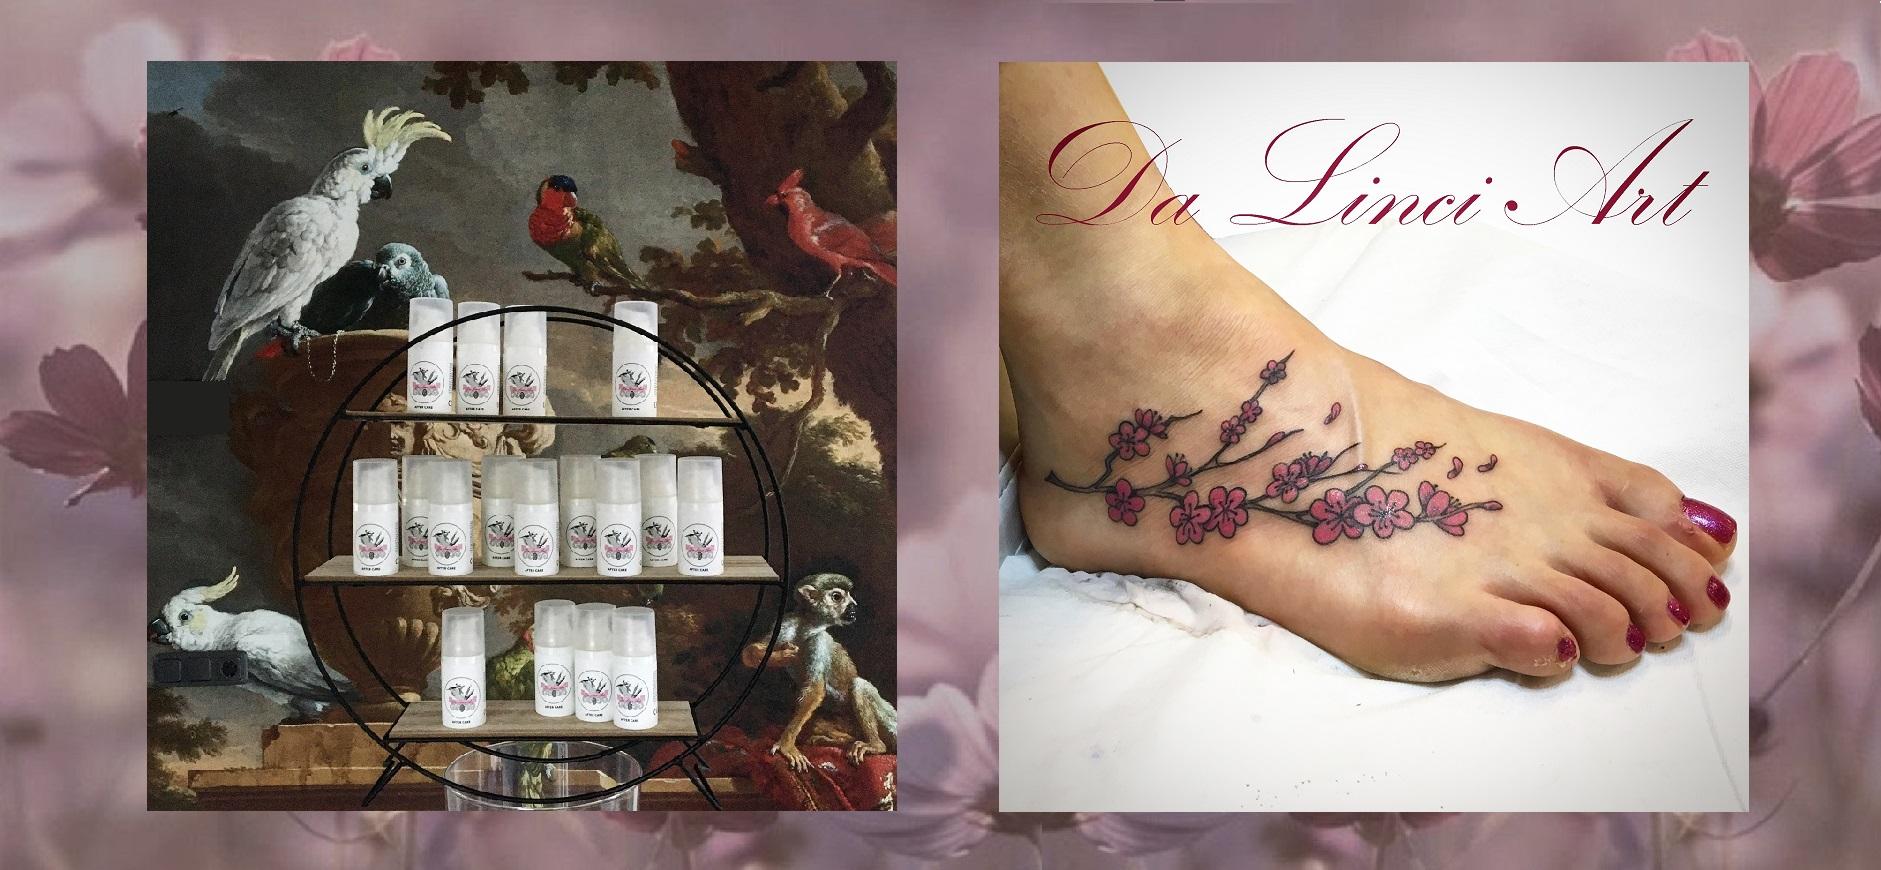 Over Da Linci Art Tattoo